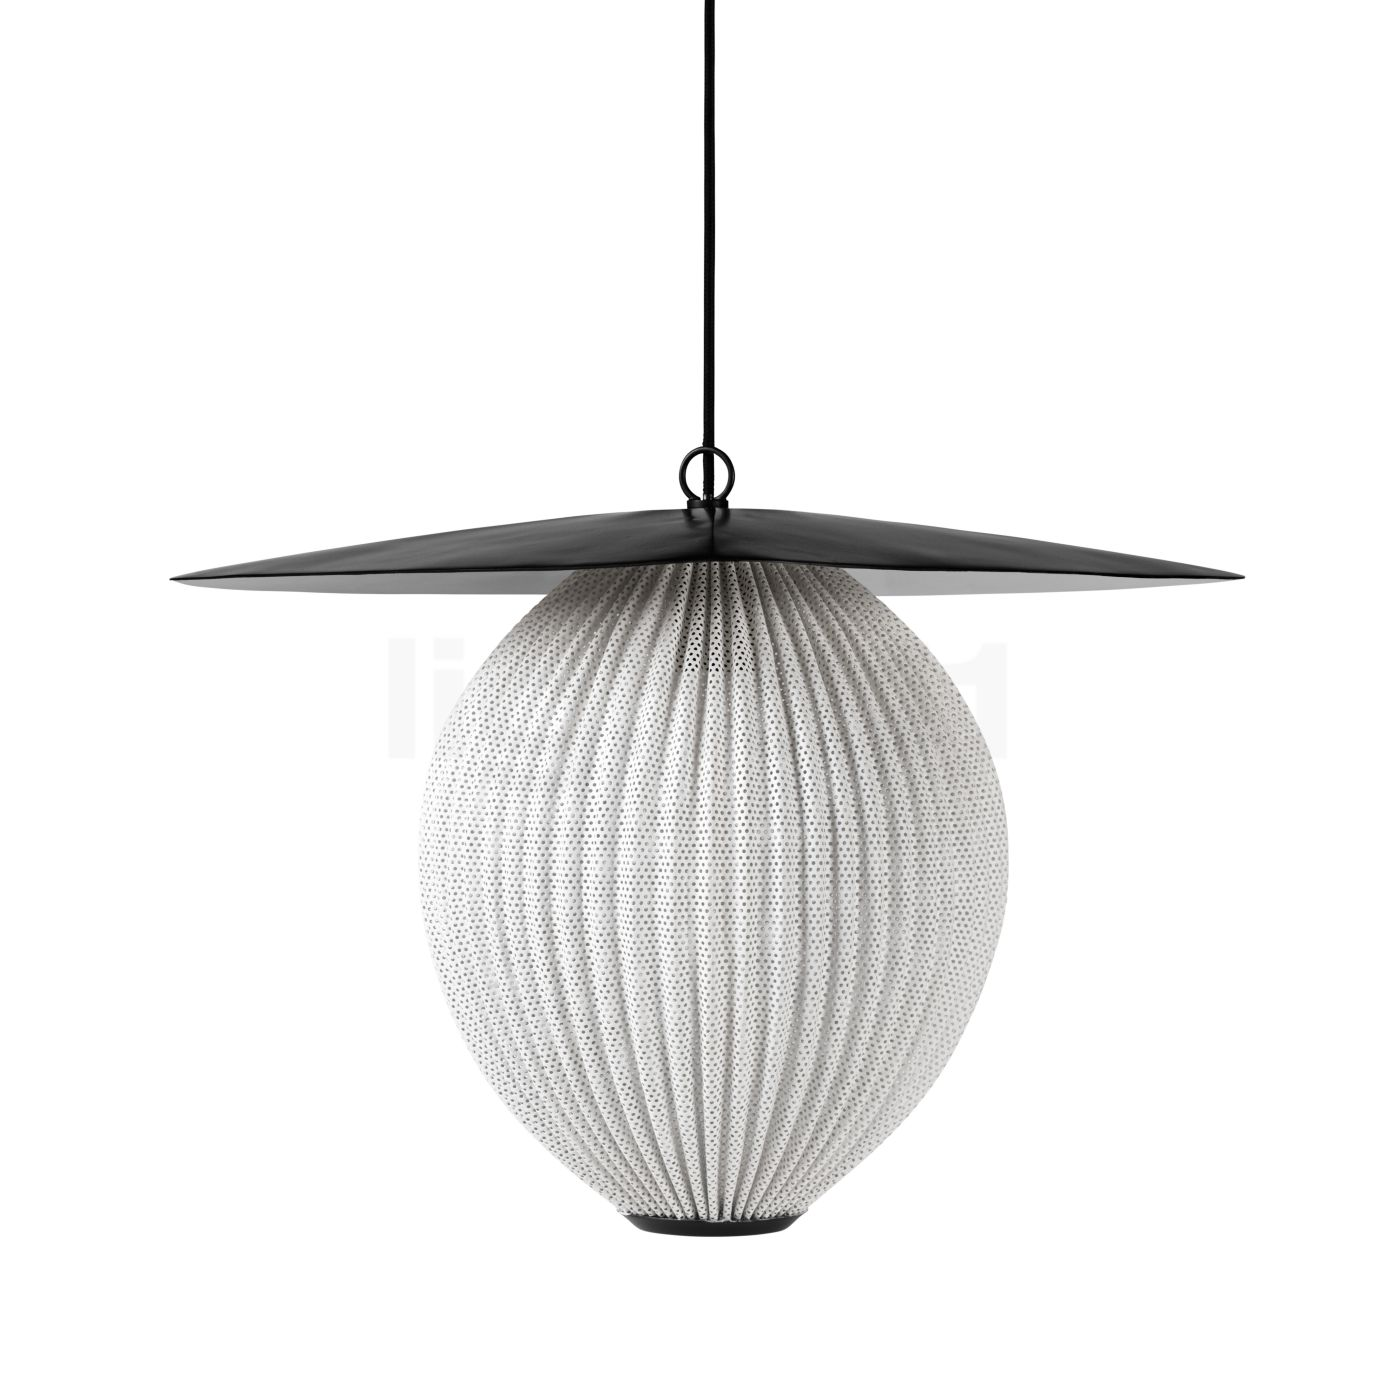 Gubi Satellite Pendant light Dining table lamps